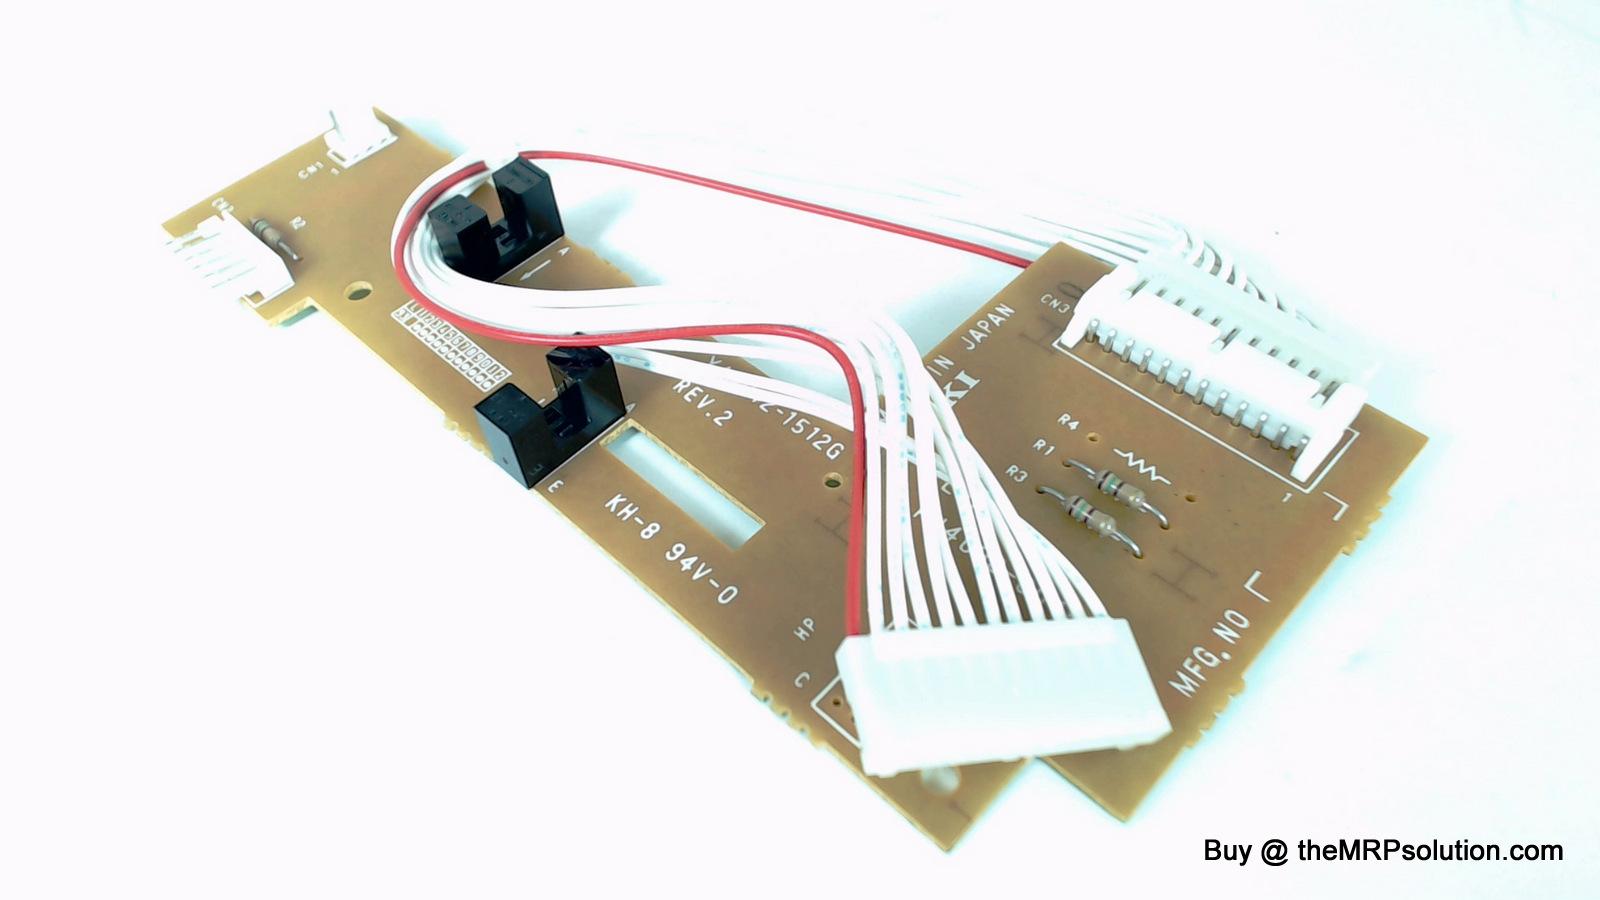 OKIDATA 55061501 PCB, LPR W/SENSOR, 3410 Refurbished